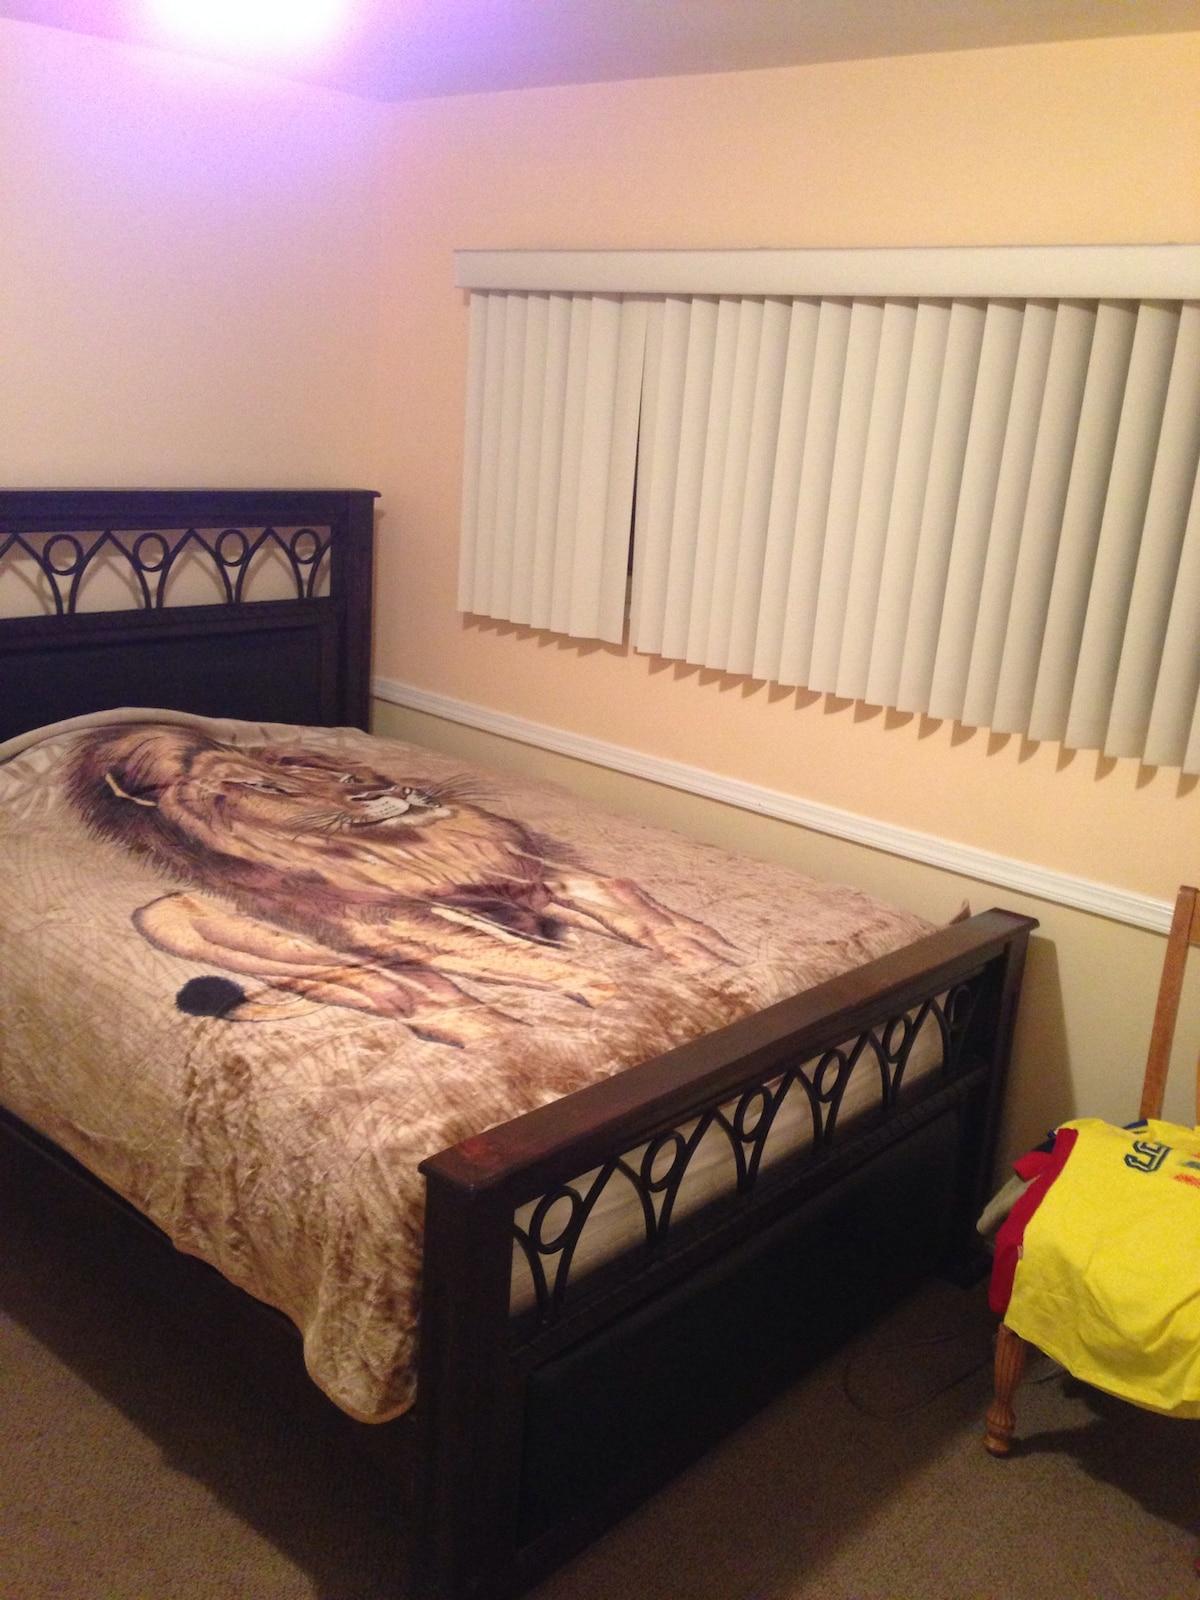 Affordable room in apt in Torrance